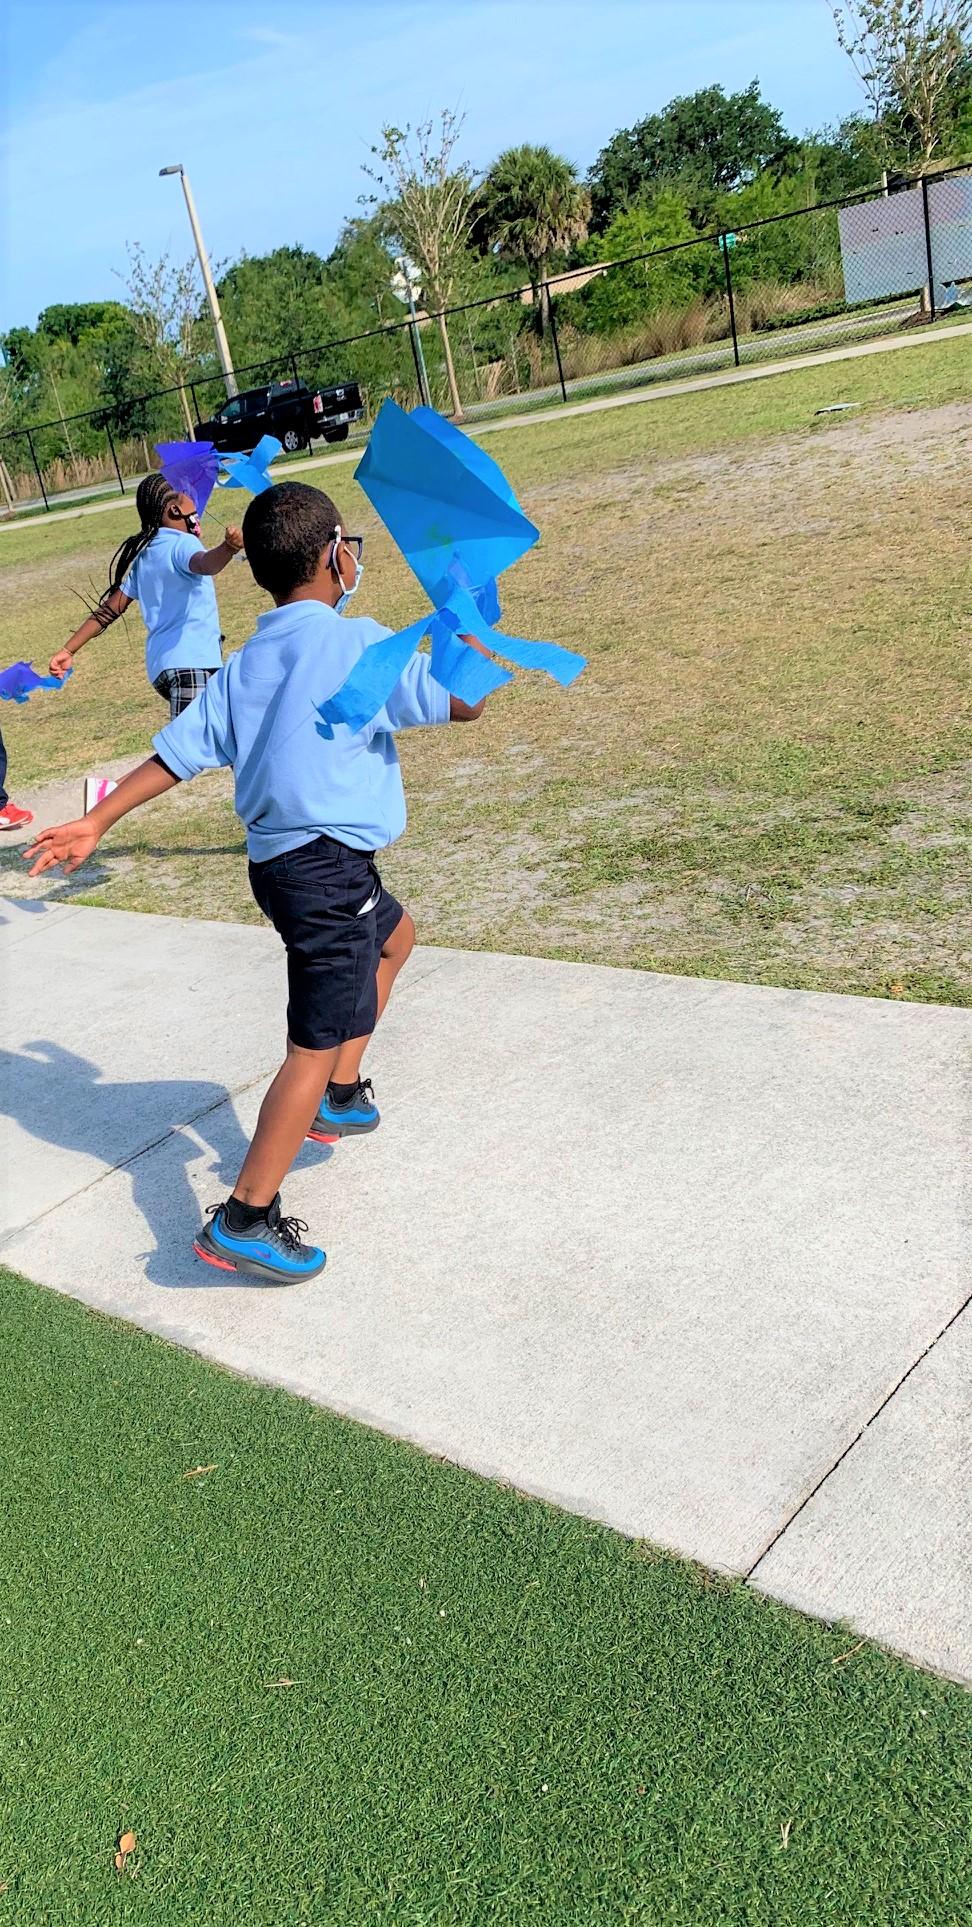 Kite Day Image number 9